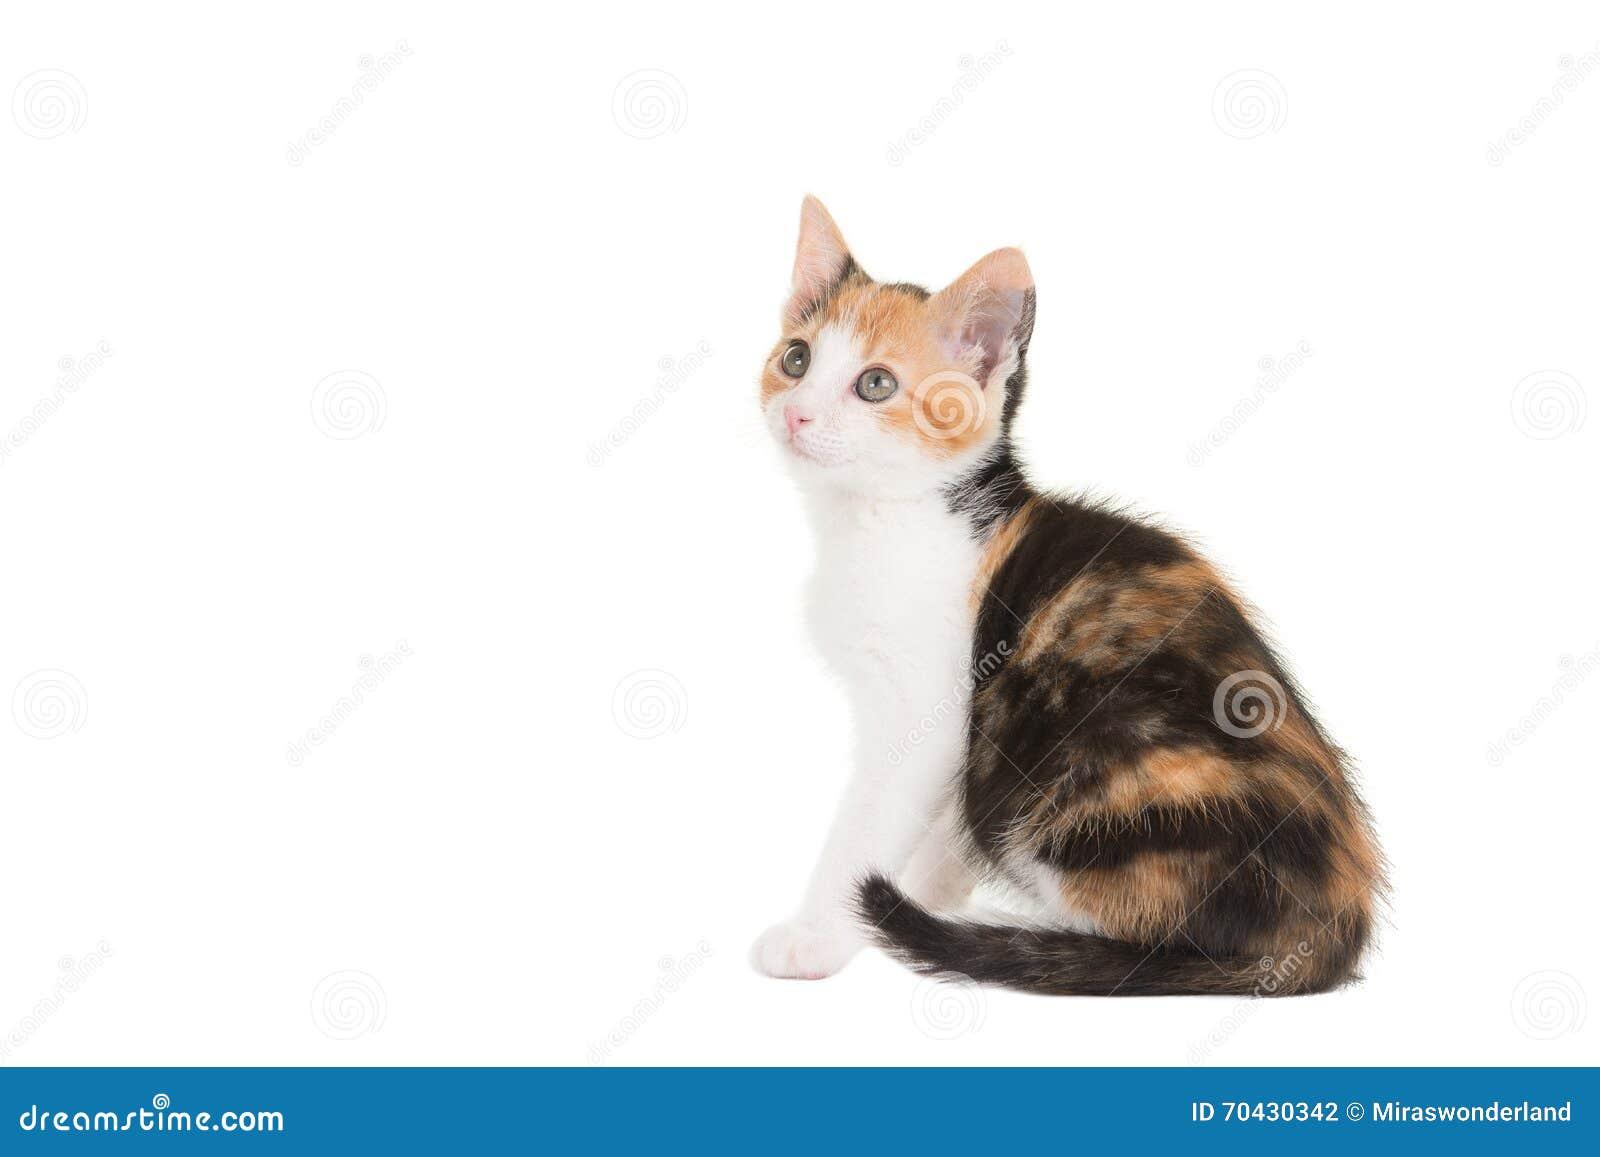 Cute tortoiseshell sitting cat looking up